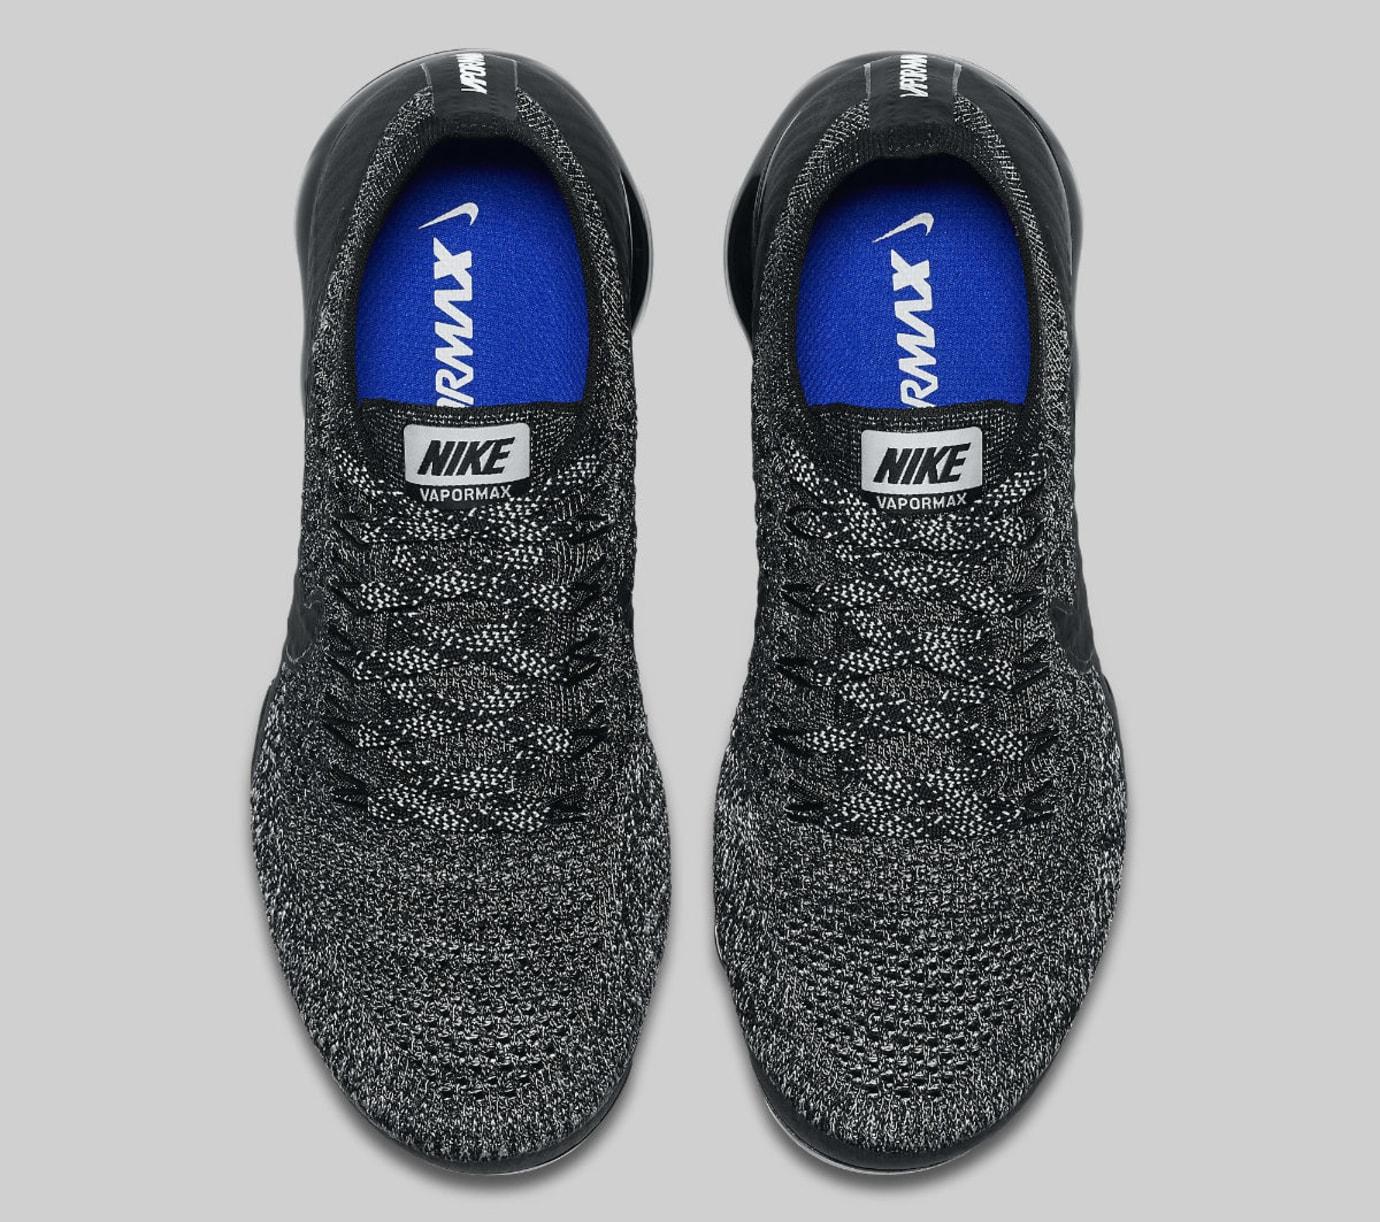 Nike Air VaporMax Oreo 2.0 Women's Release Date Top 849557-041